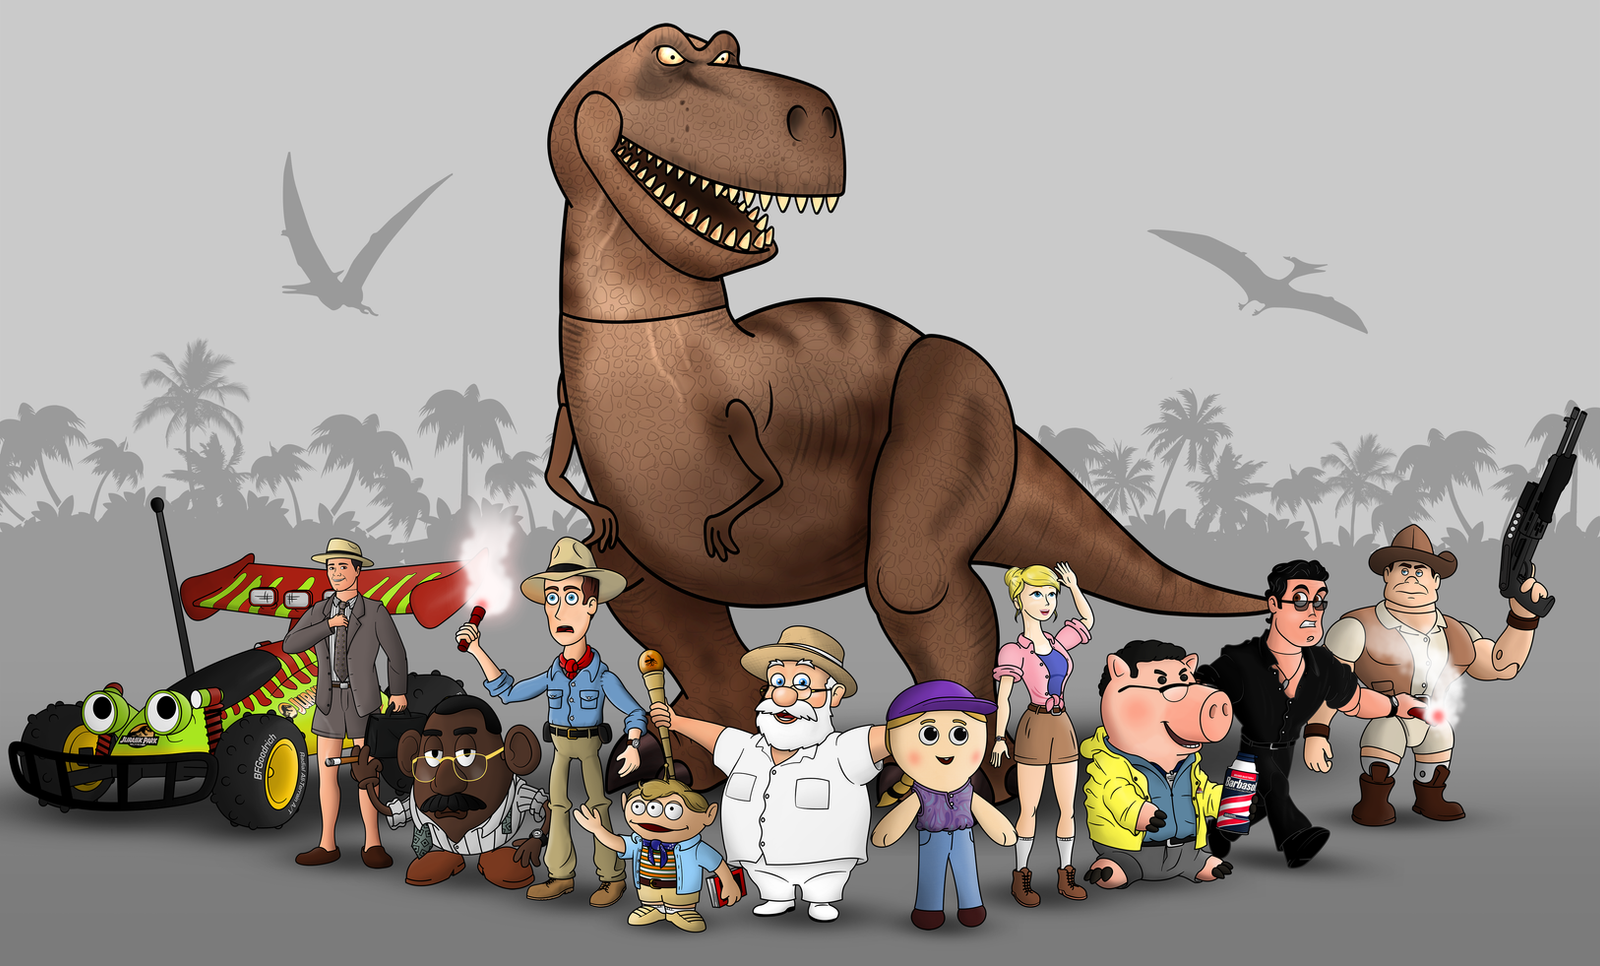 Jurassic Toy Park by DonTedesco on DeviantArt